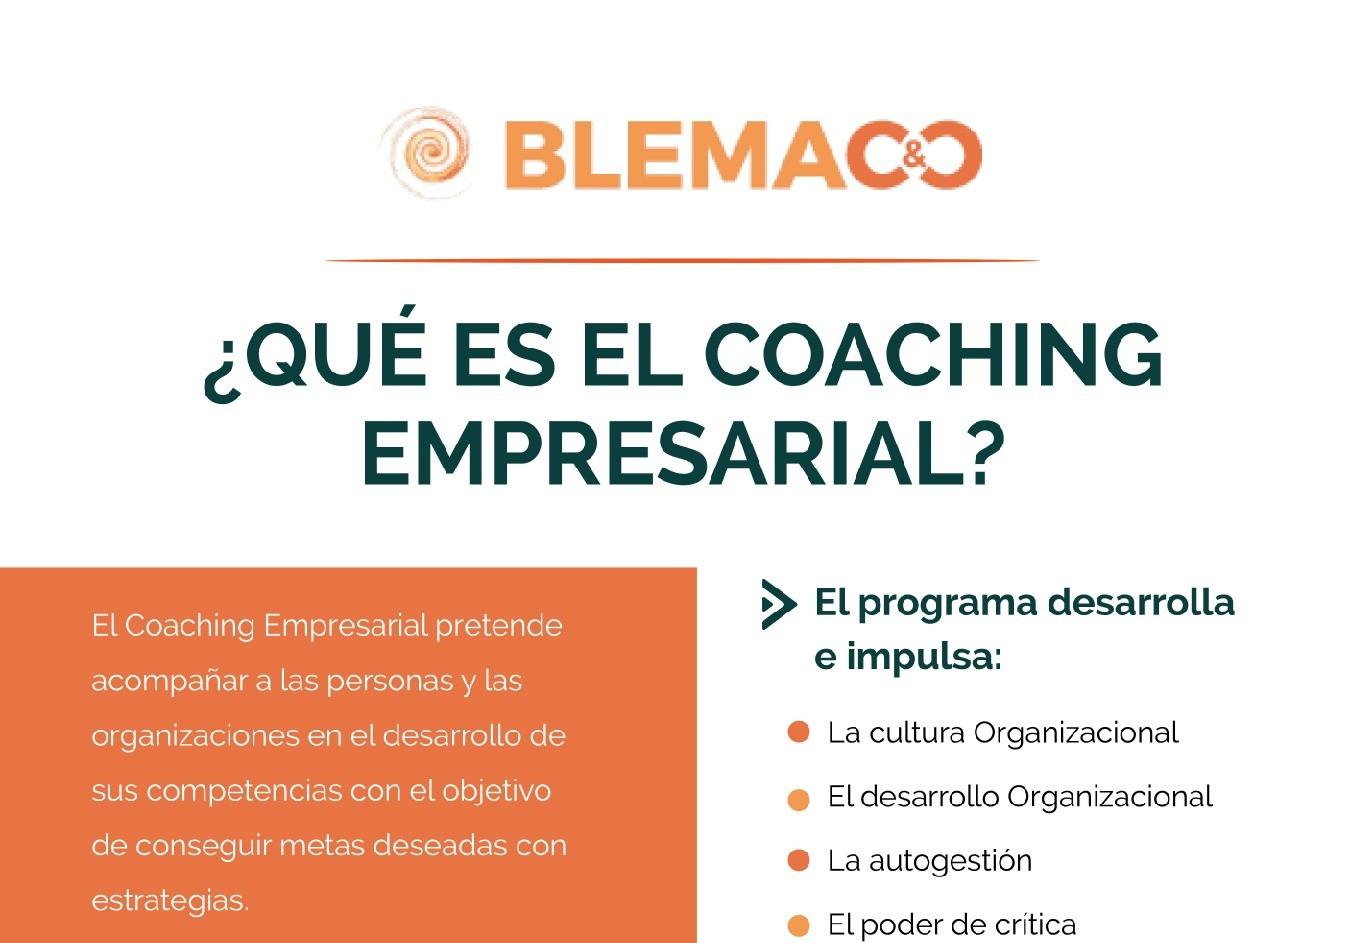 infografia-blemac-p1